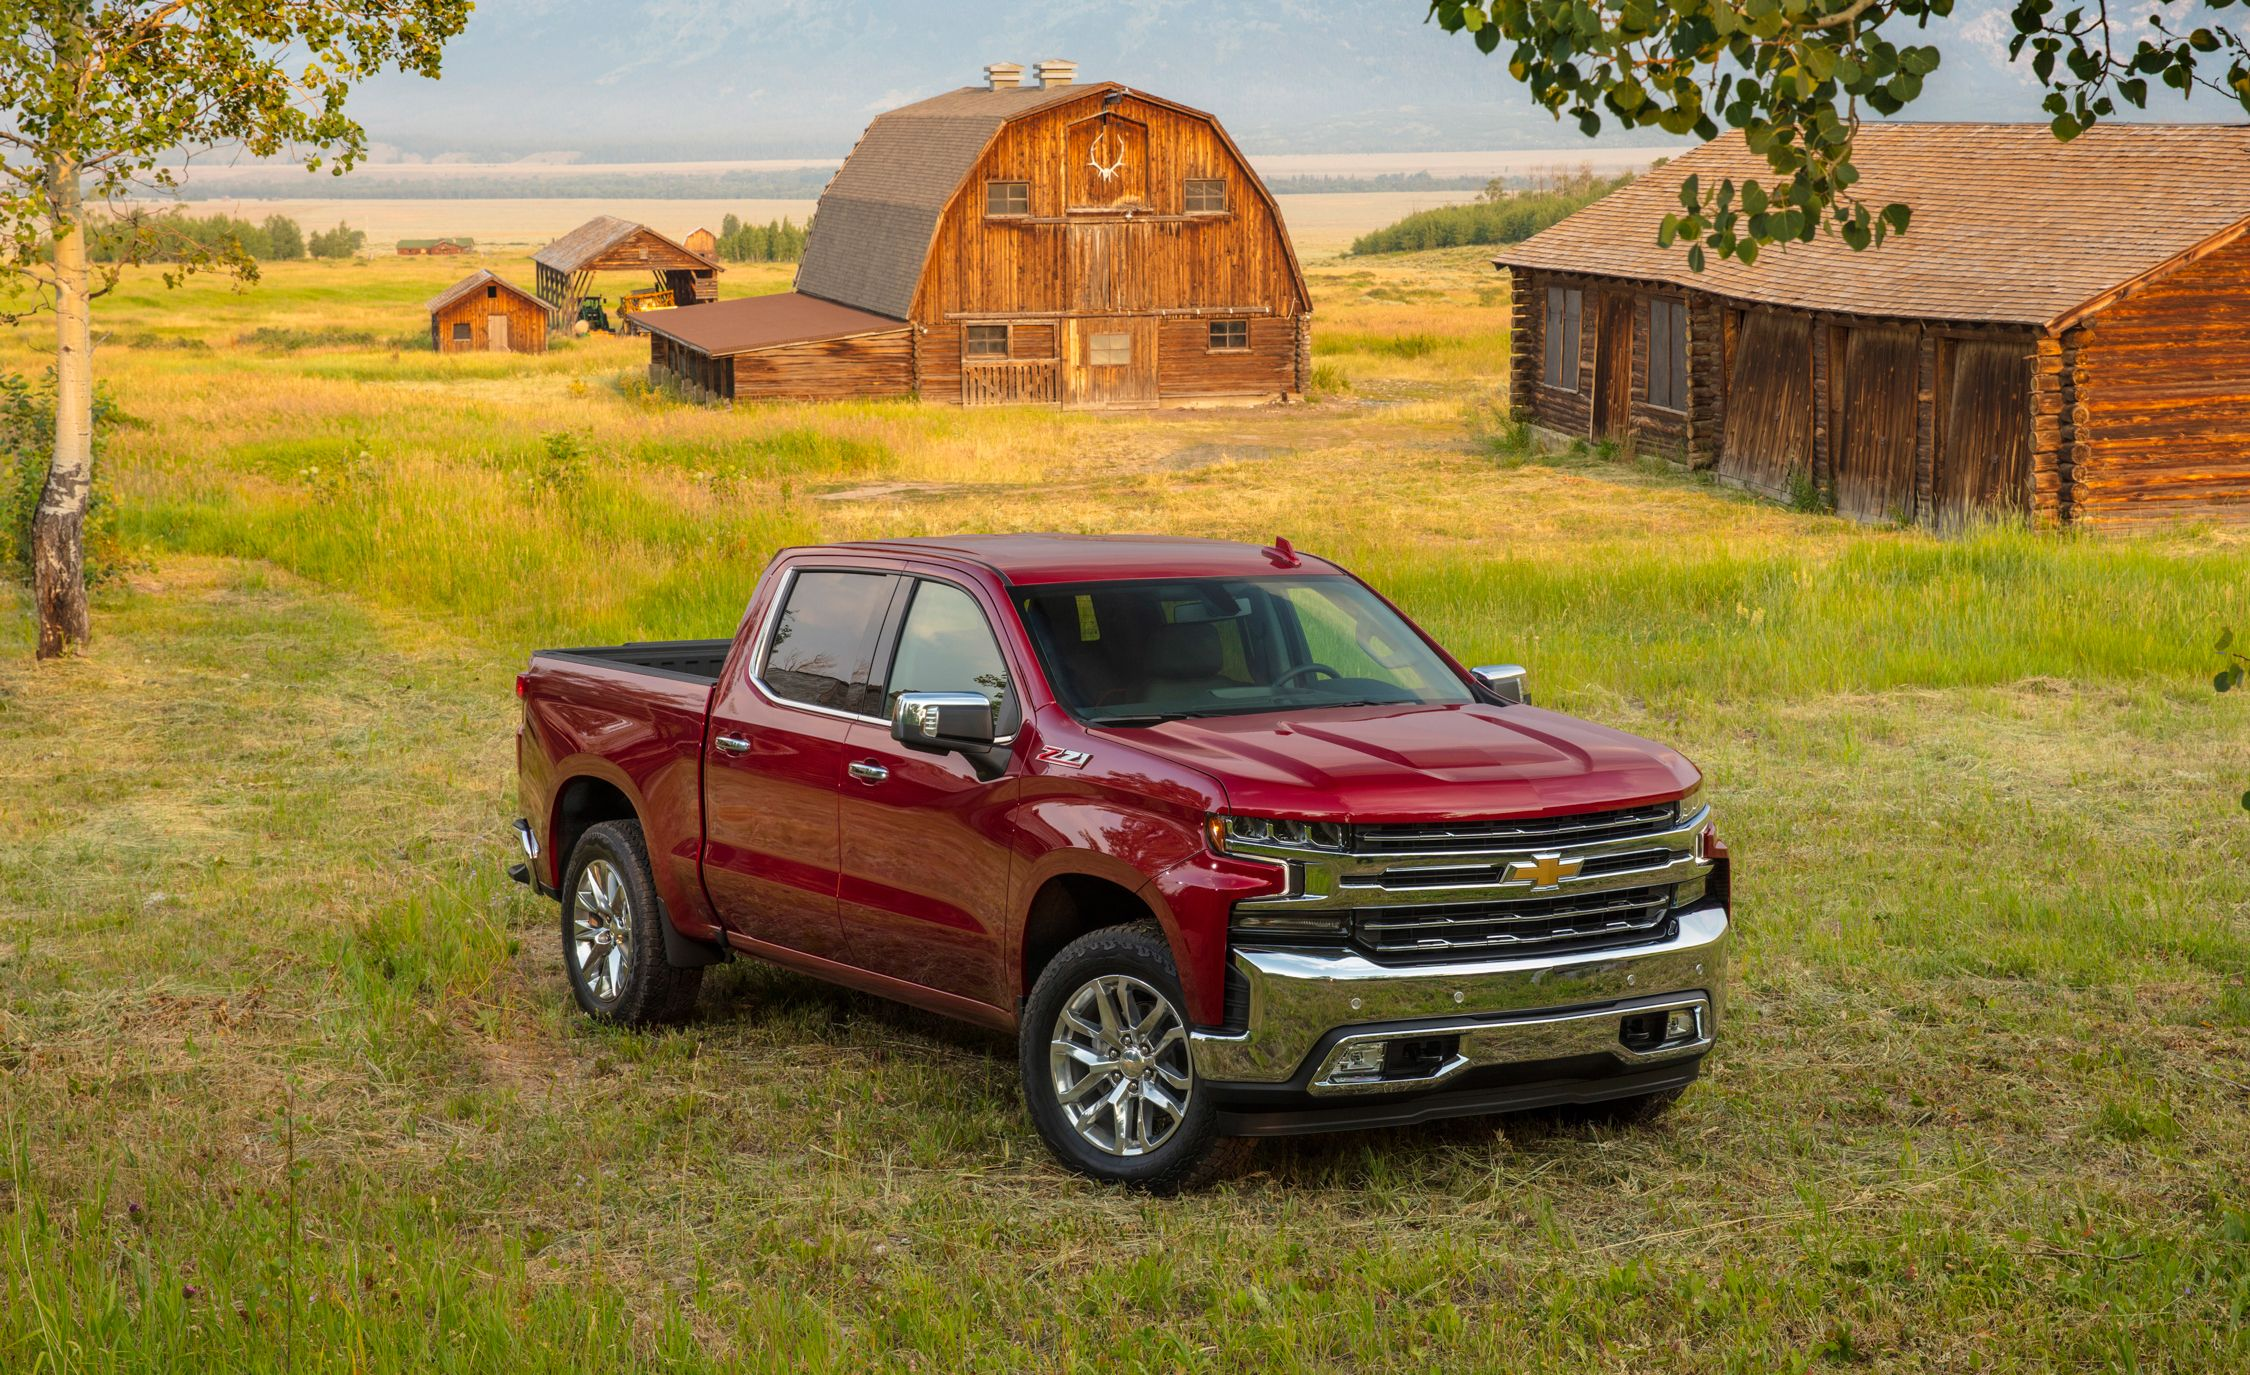 7 Best Full-Size Pickup Trucks of 2019 - All Big Pickup